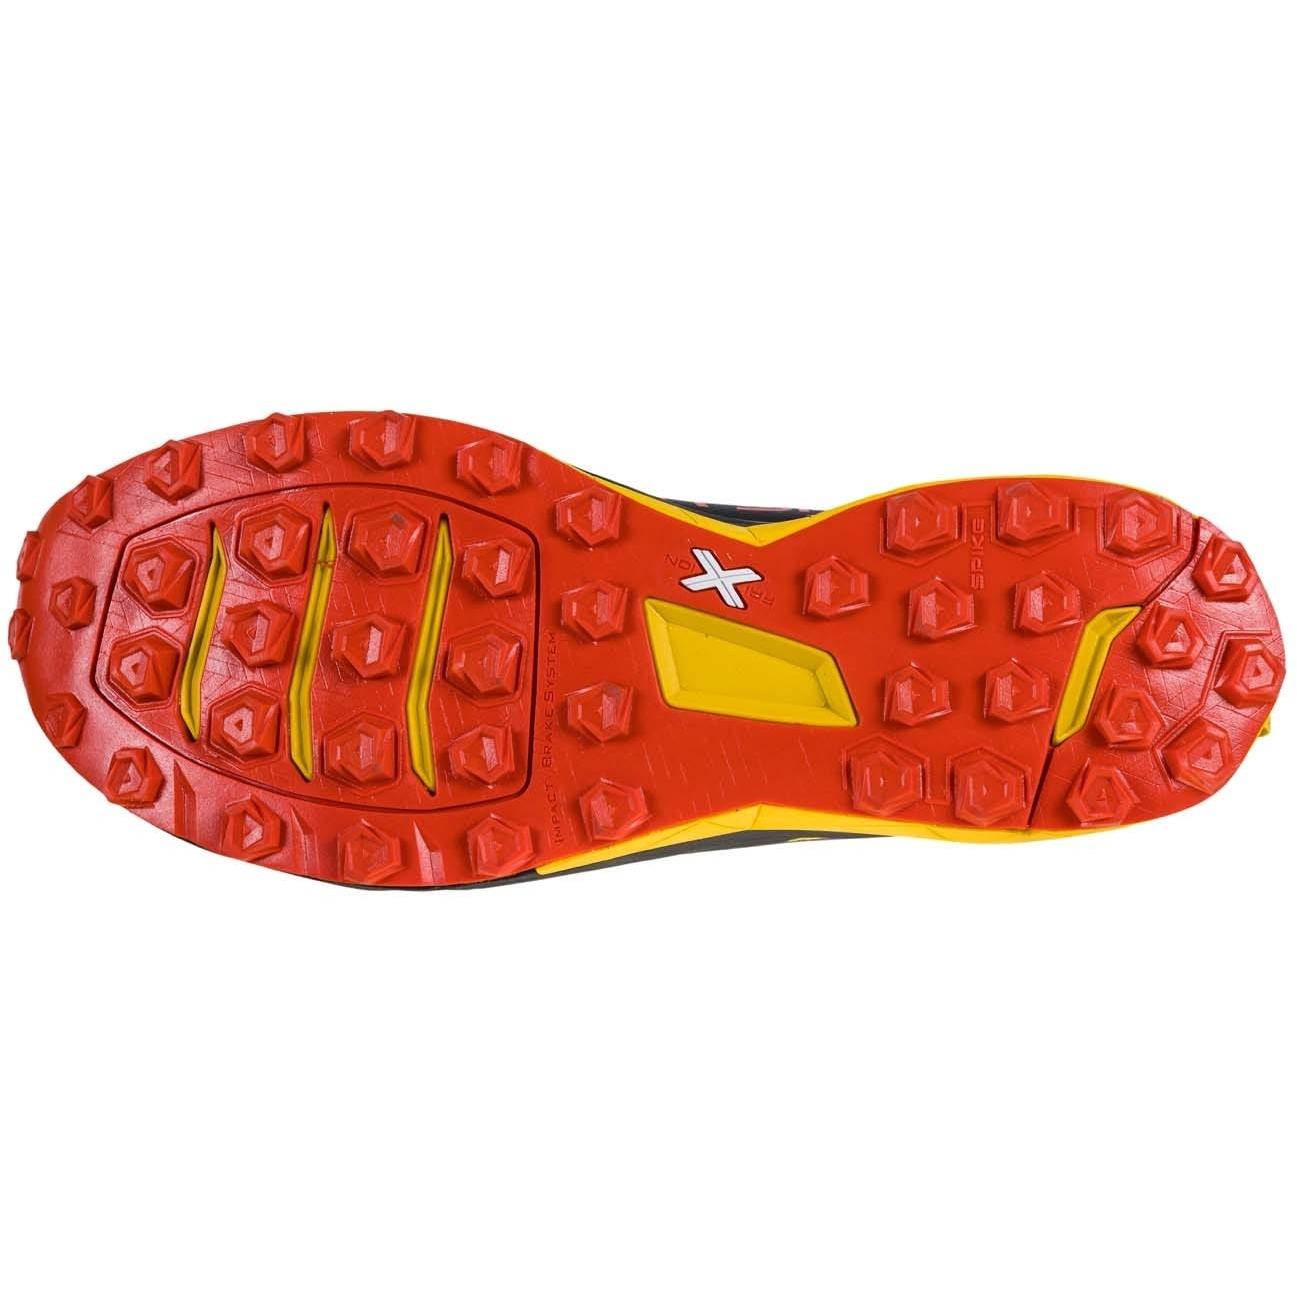 Image of La Sportiva Kaptiva GTX Running Shoes - Black/Yellow